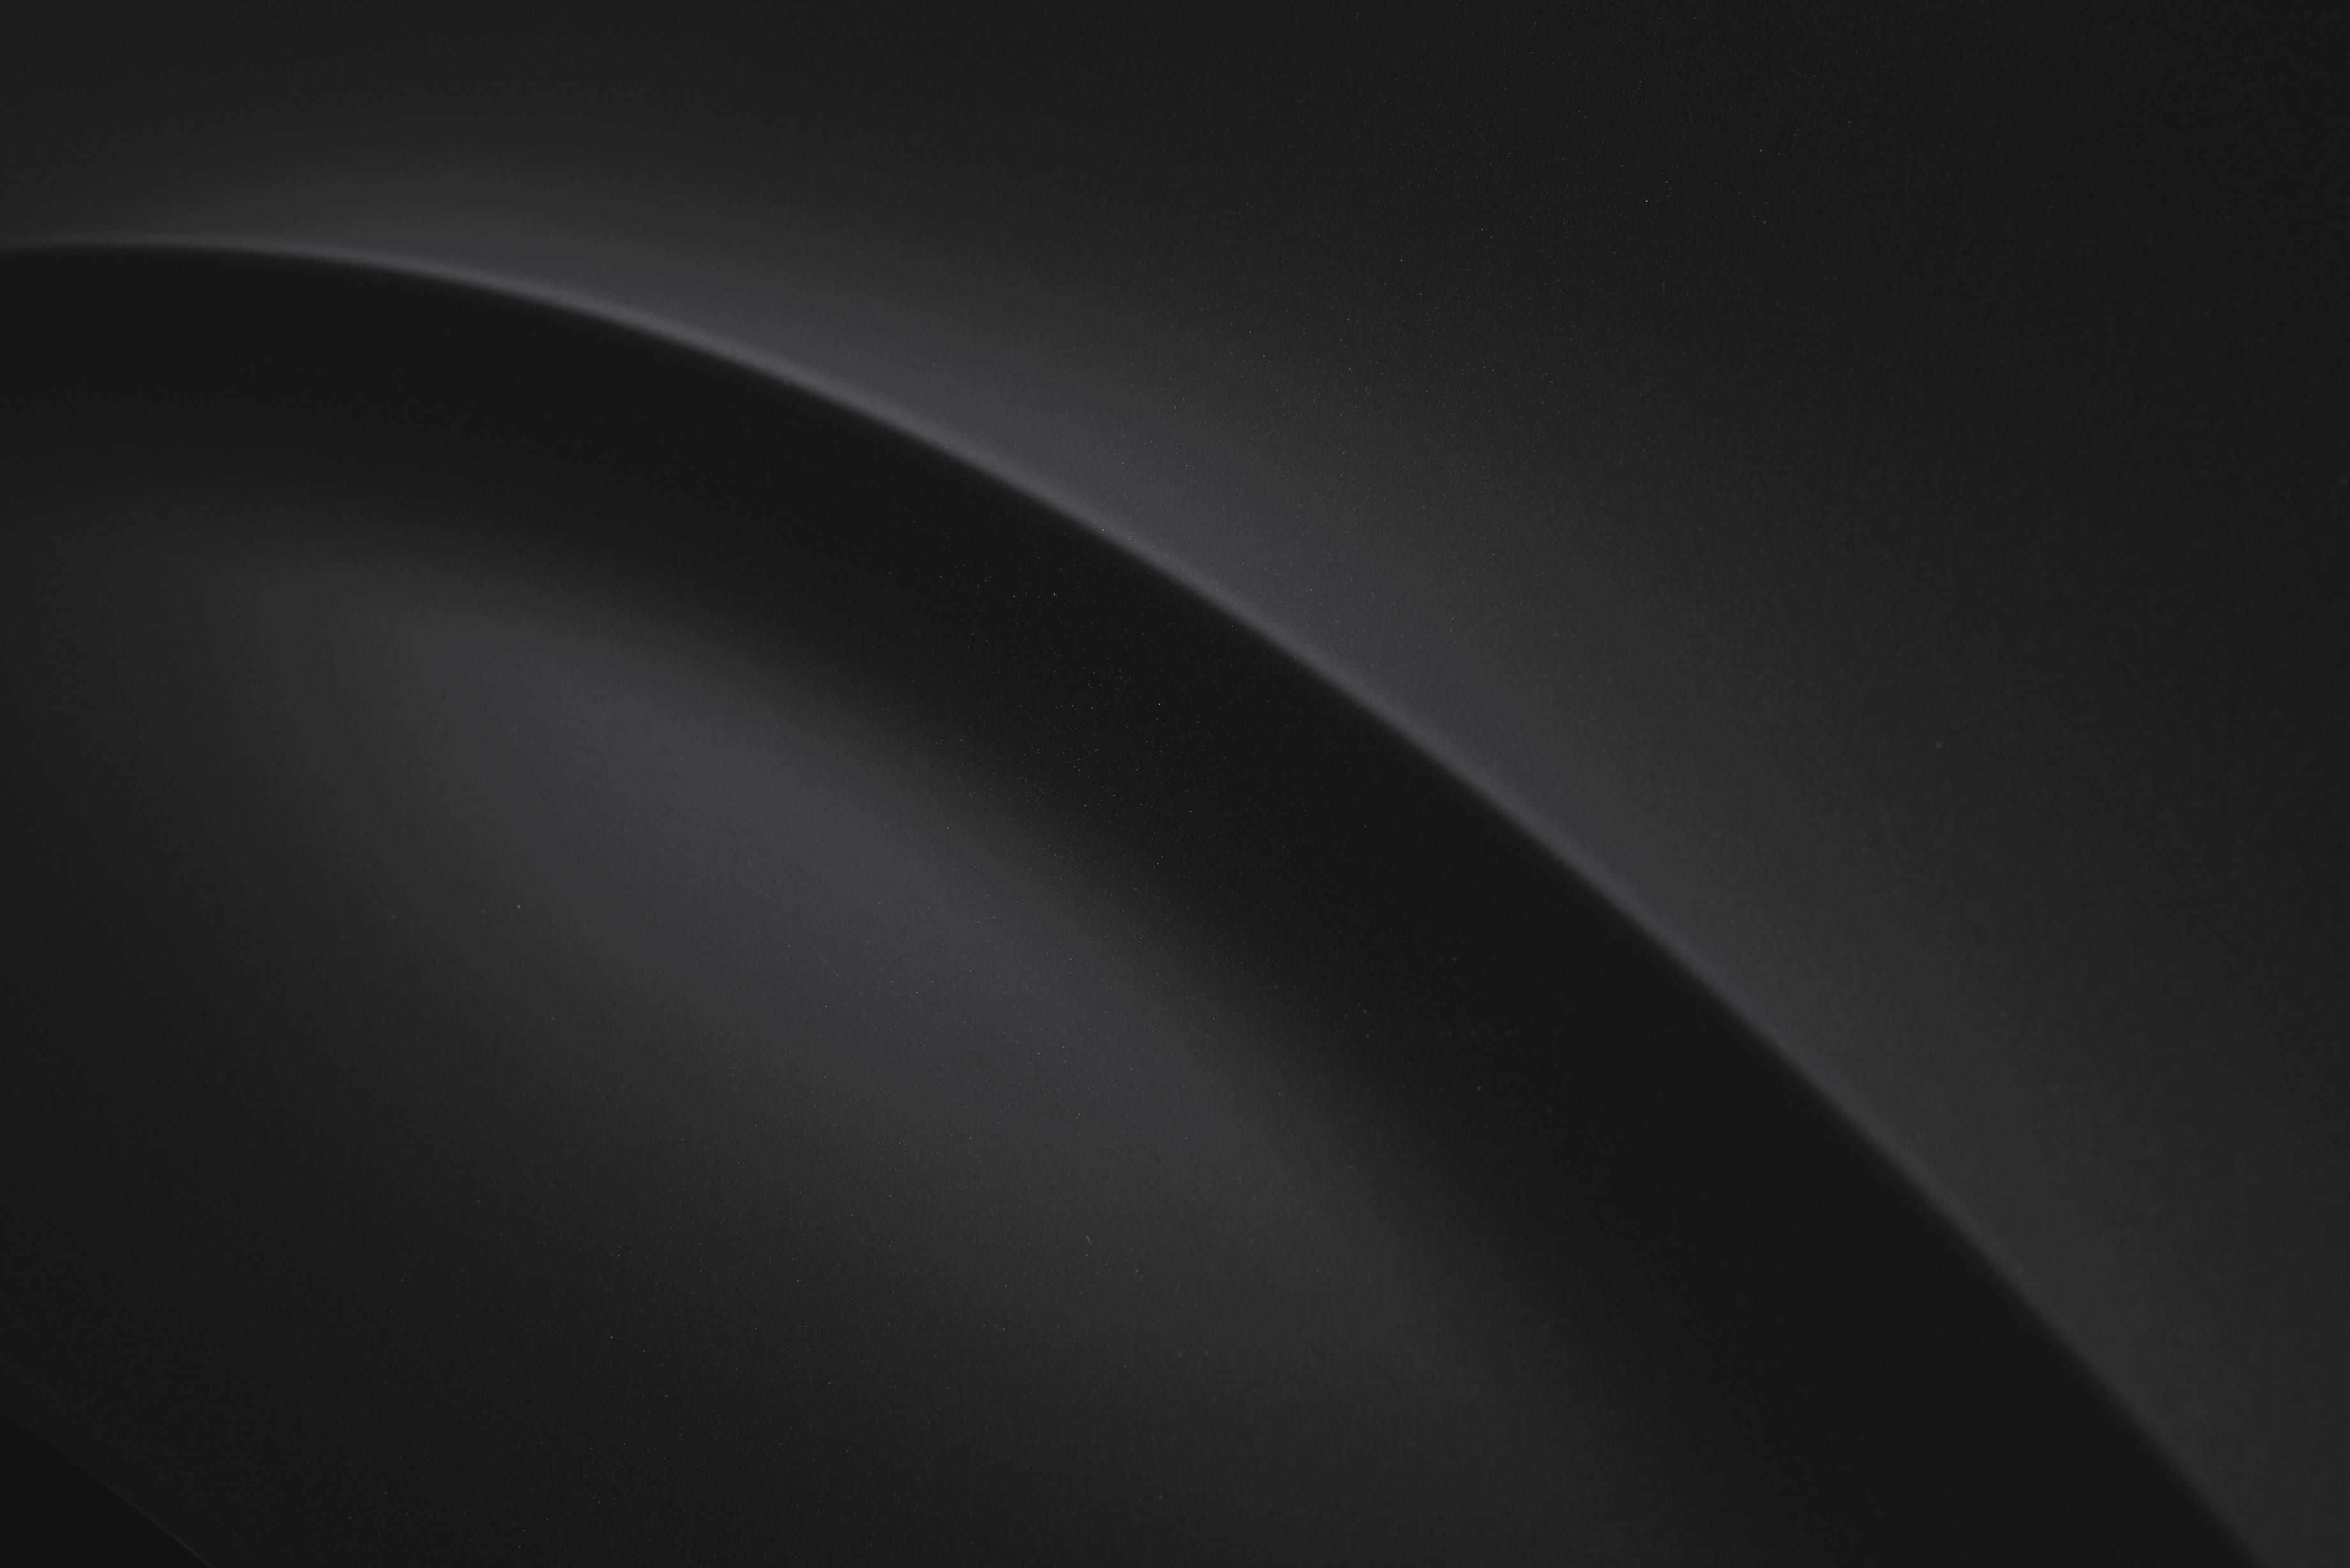 Abyss Black) Bild